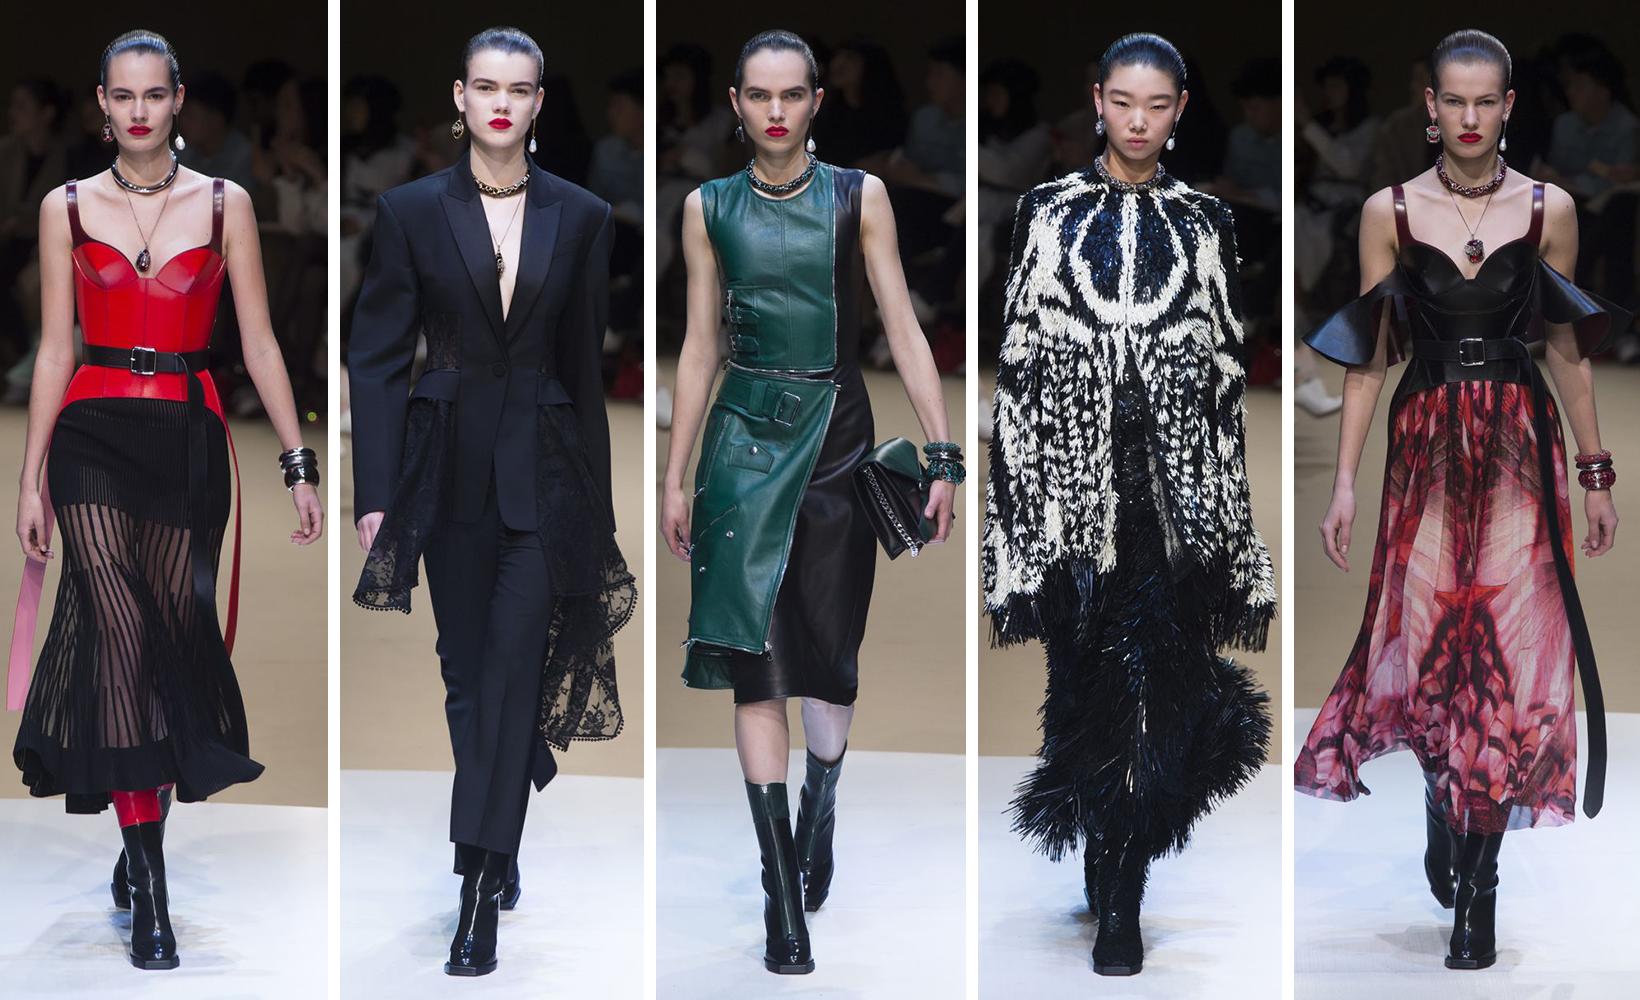 alexander_mcqueen_parizs_2018_divathet_oszi-teli_ready-to-wear_kollekcio.png